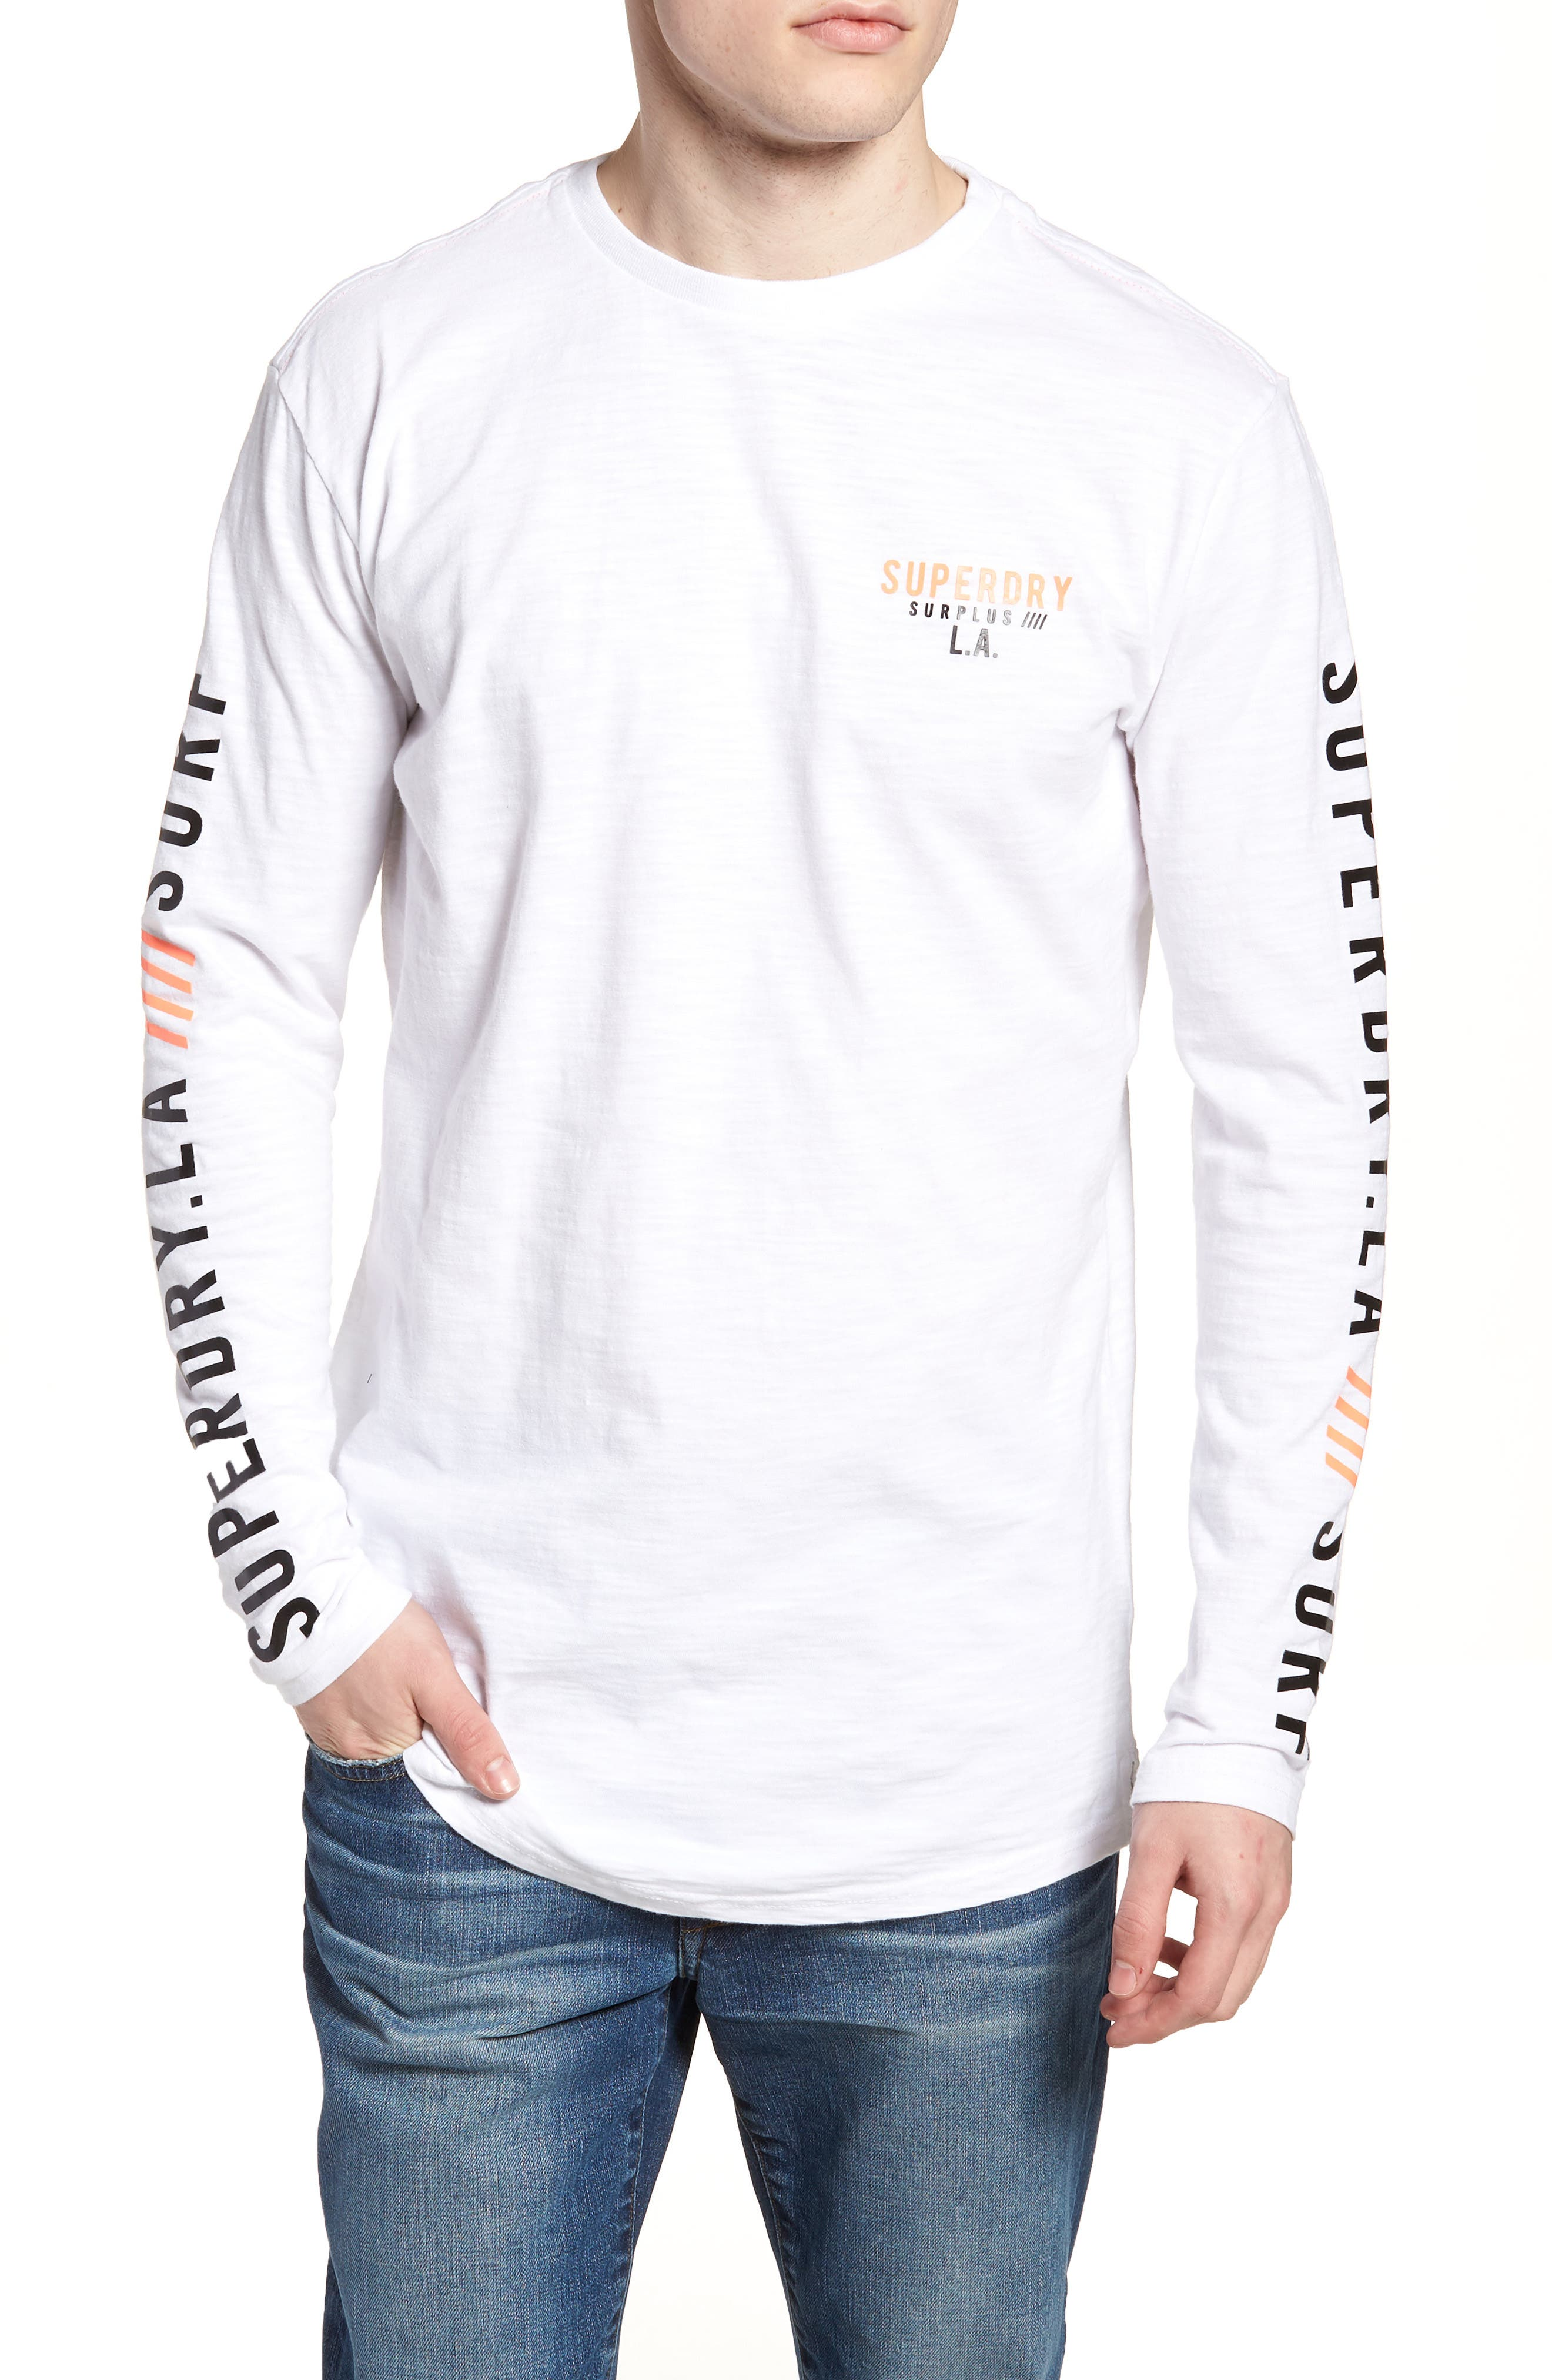 Superdry Surplus Goods T-Shirt